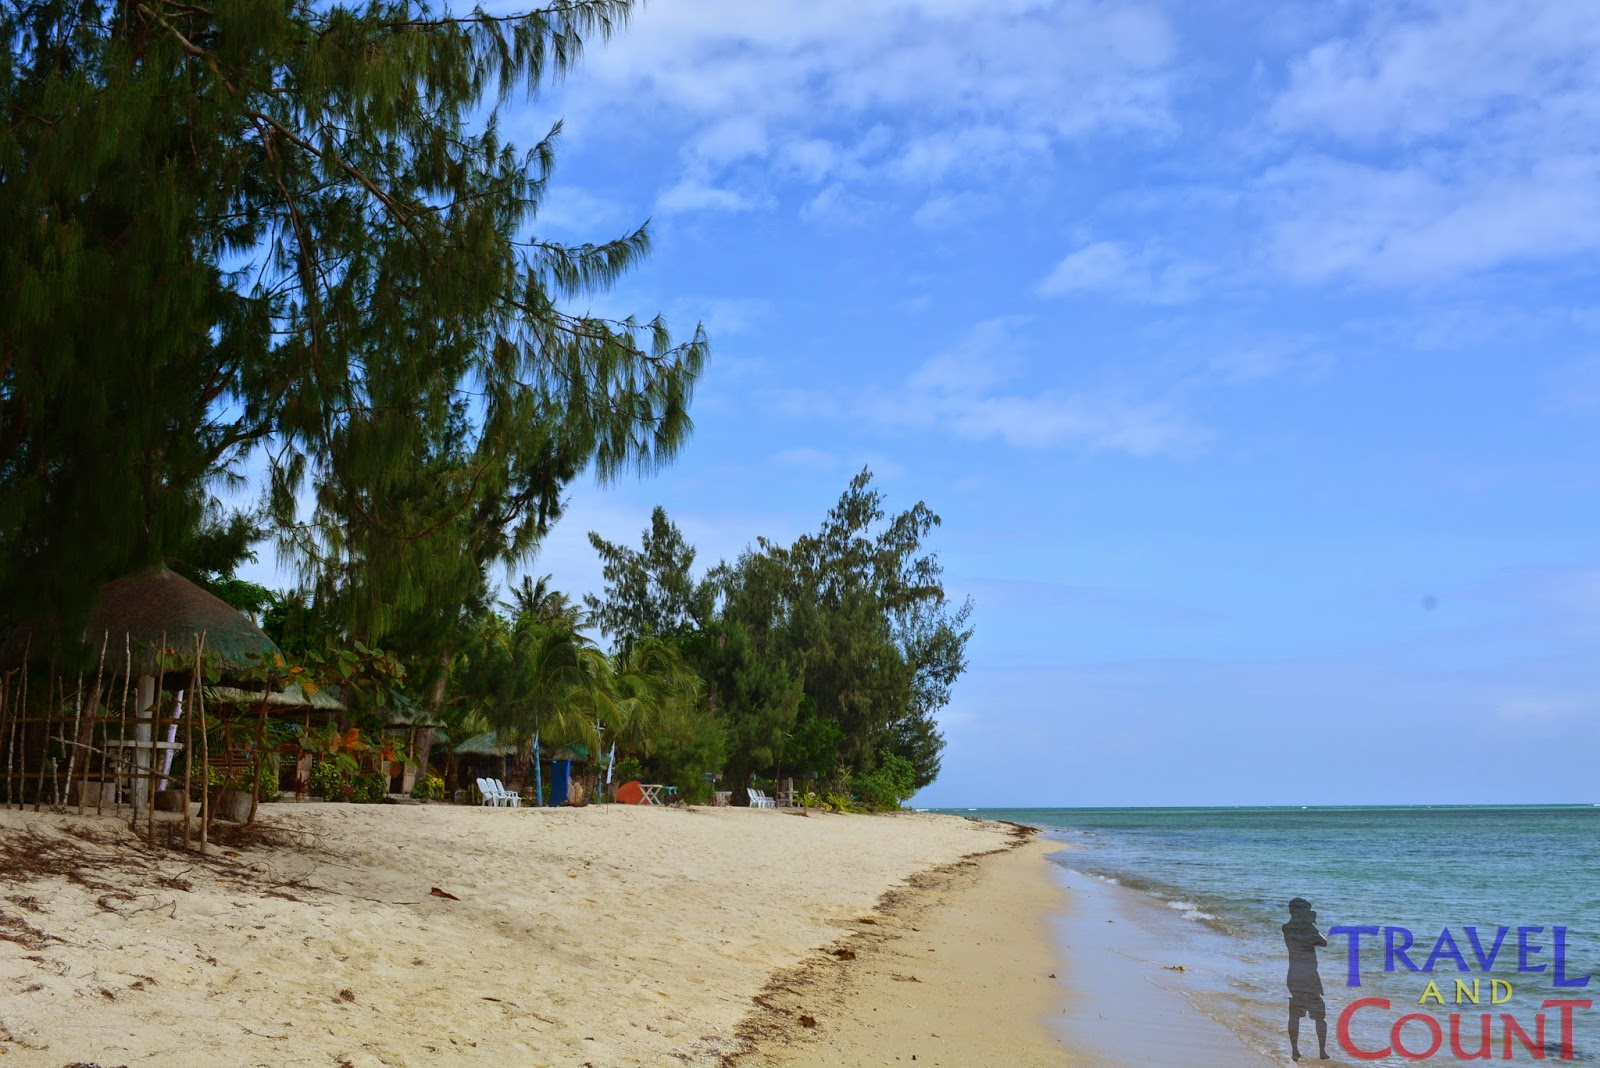 Joven's Resort's beach front, Cagbalete Island